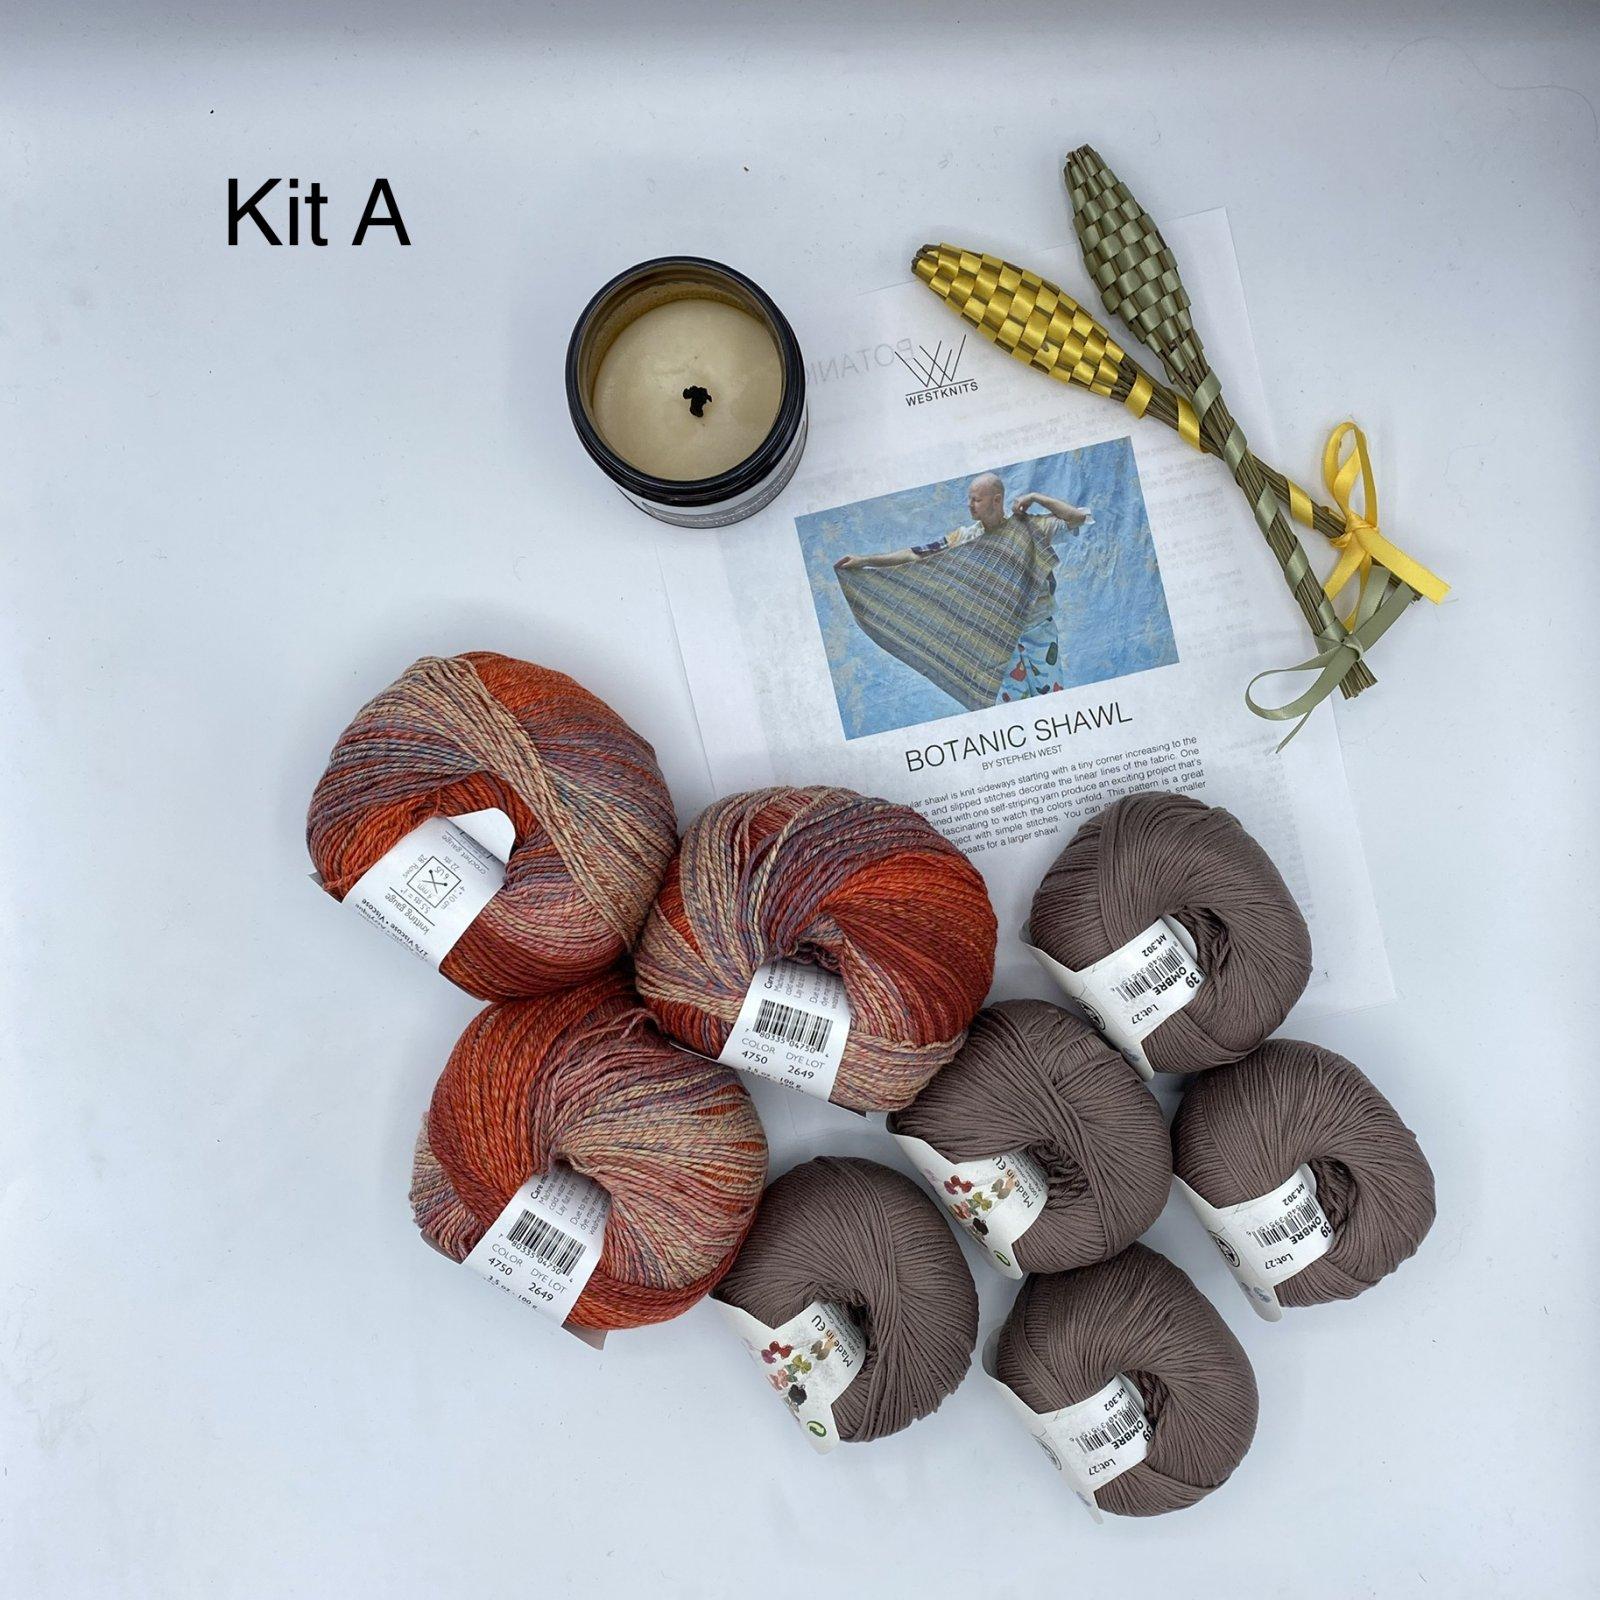 Botanic Shawl Cotton Blend